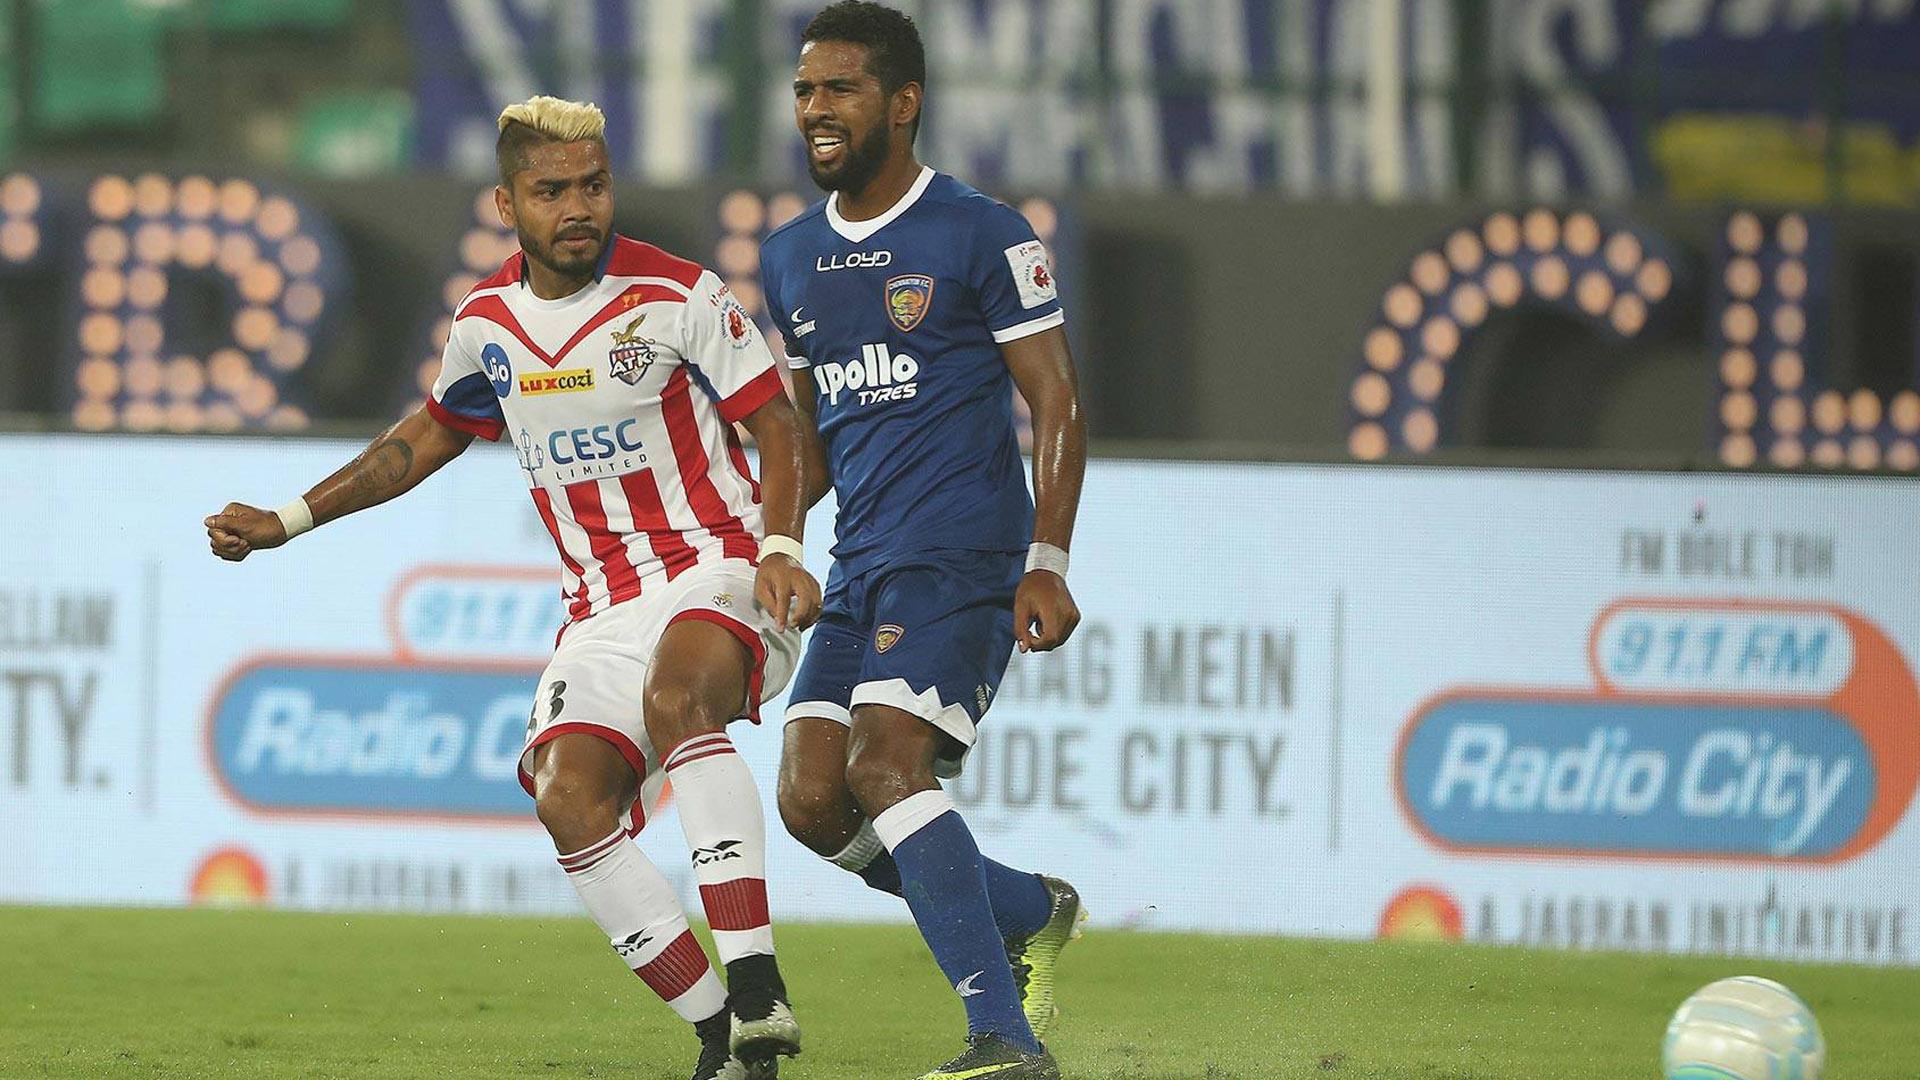 Prabir Das Chennaiyin FC ATK ISL season 4 2017/2018